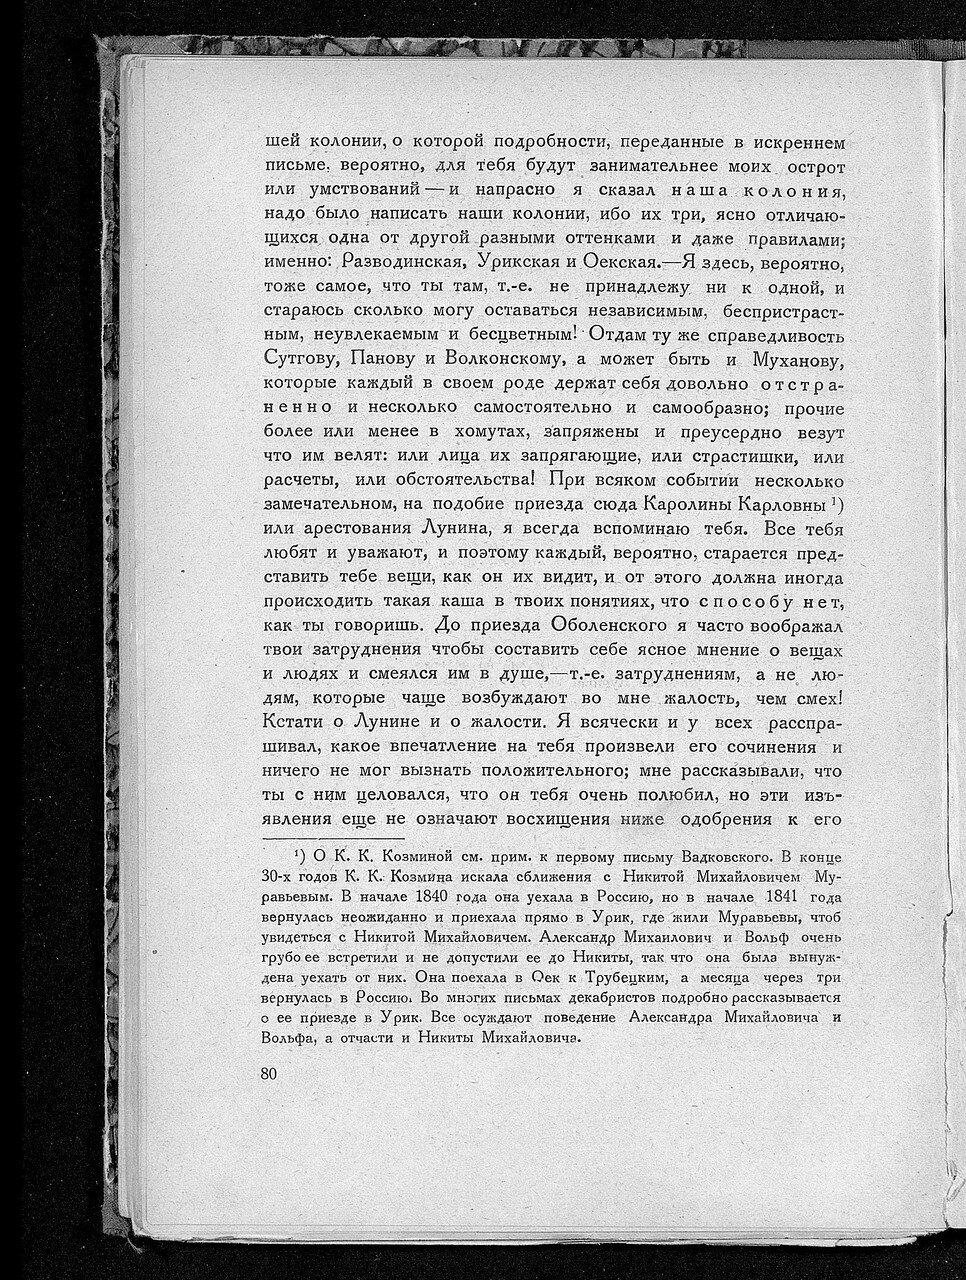 https://img-fotki.yandex.ru/get/477594/199368979.a1/0_21434b_6b5d50b2_XXXL.jpg